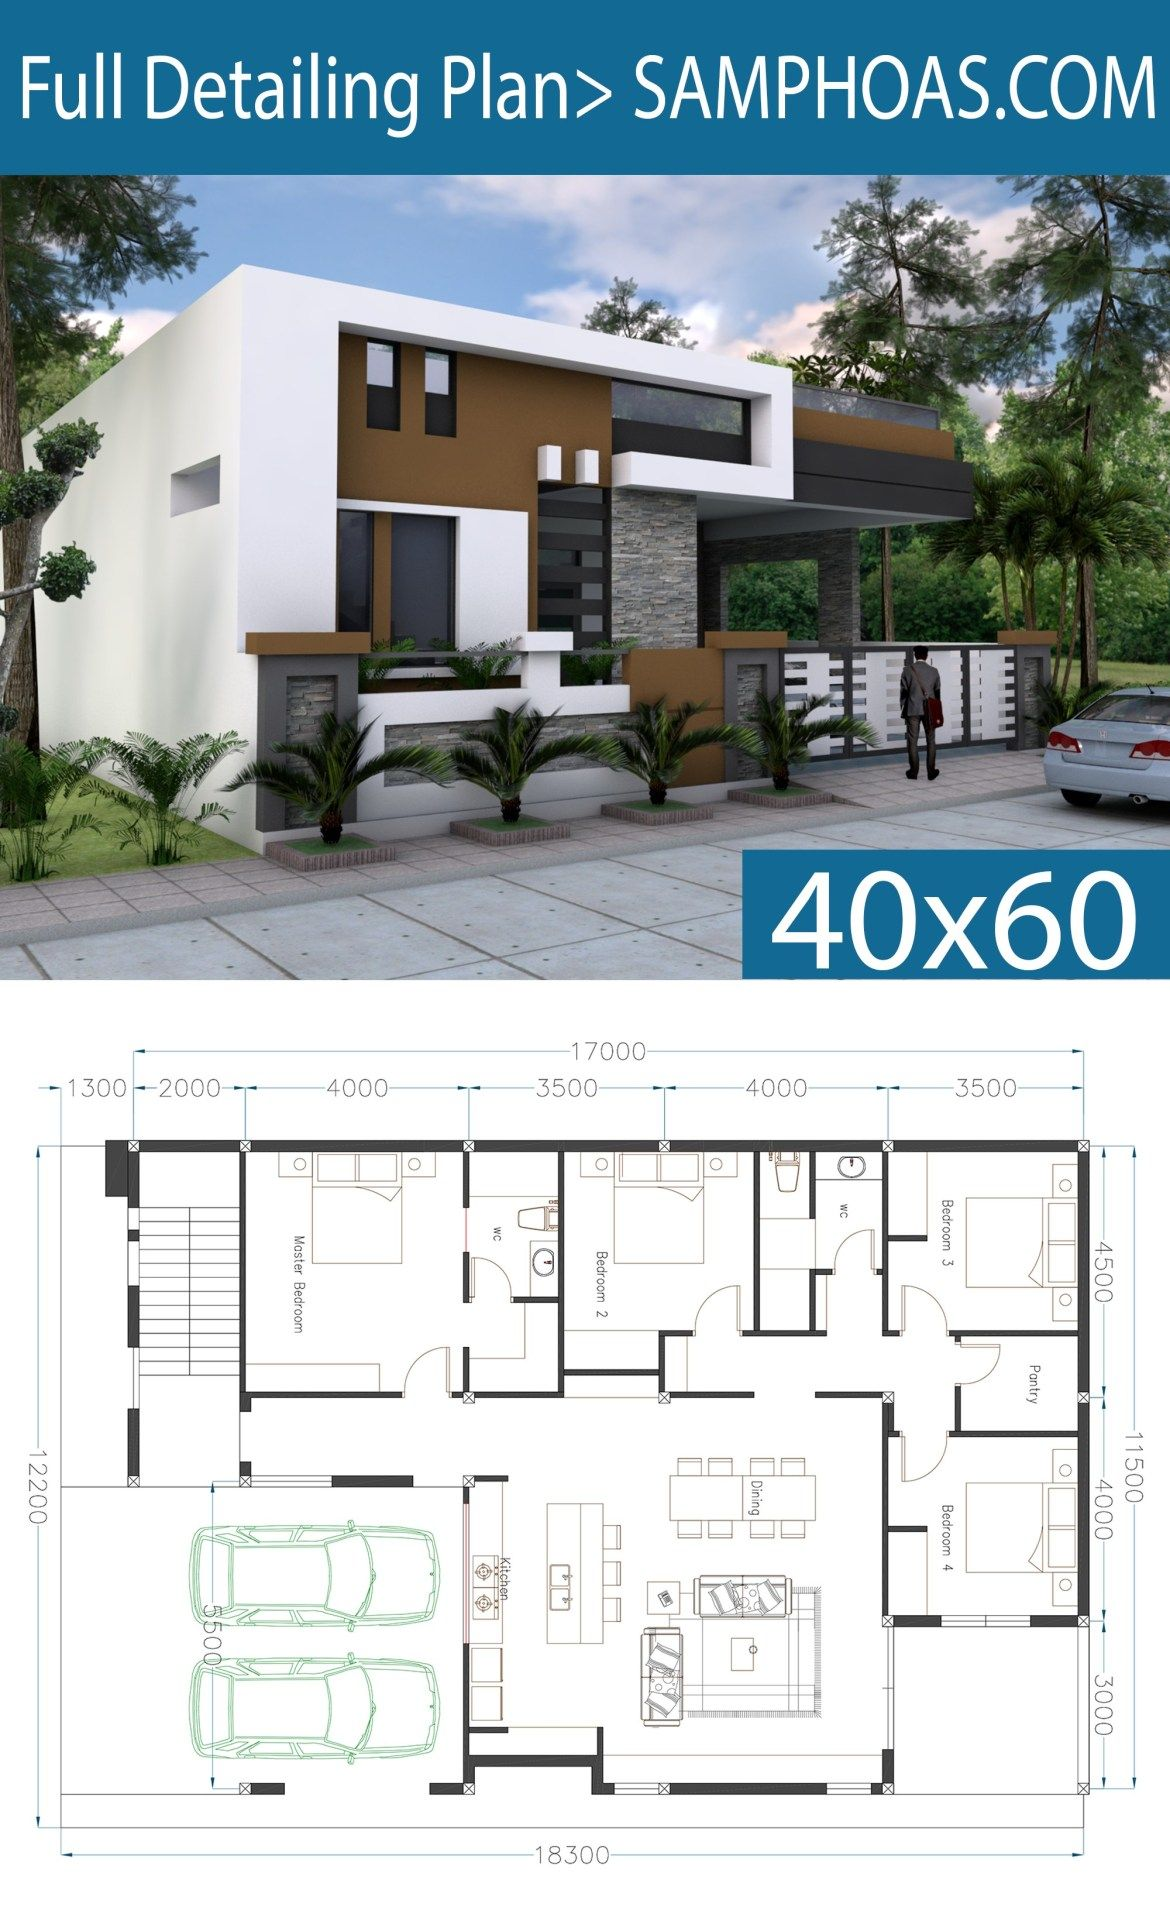 One Story House Plan 40x60 Sketchup Home Design Samphoas Plansearch Model House Plan Modern House Plans Village House Design